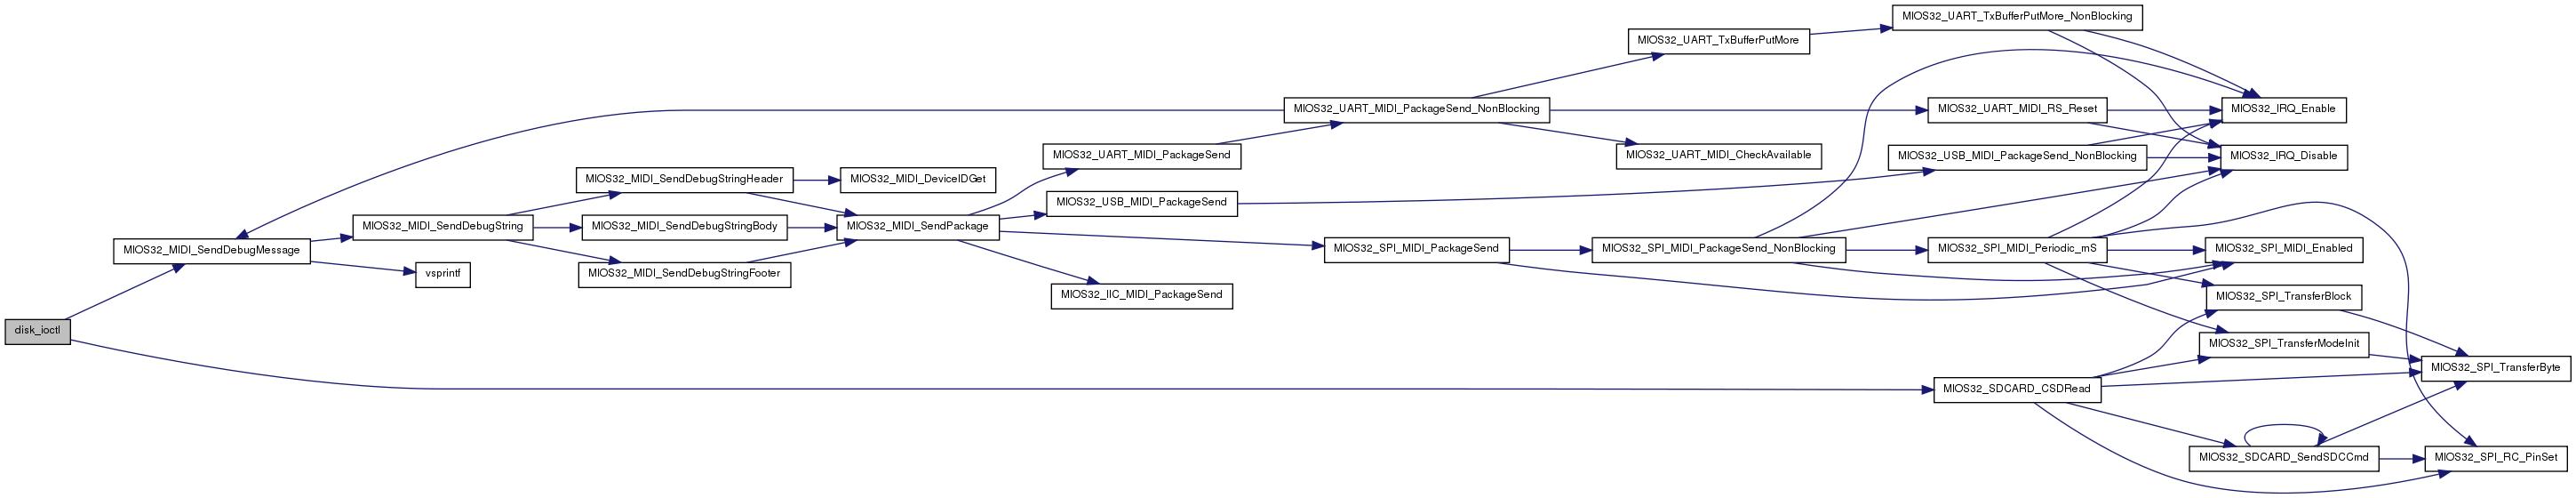 MIOS32: modules/fatfs/src/diskio h File Reference